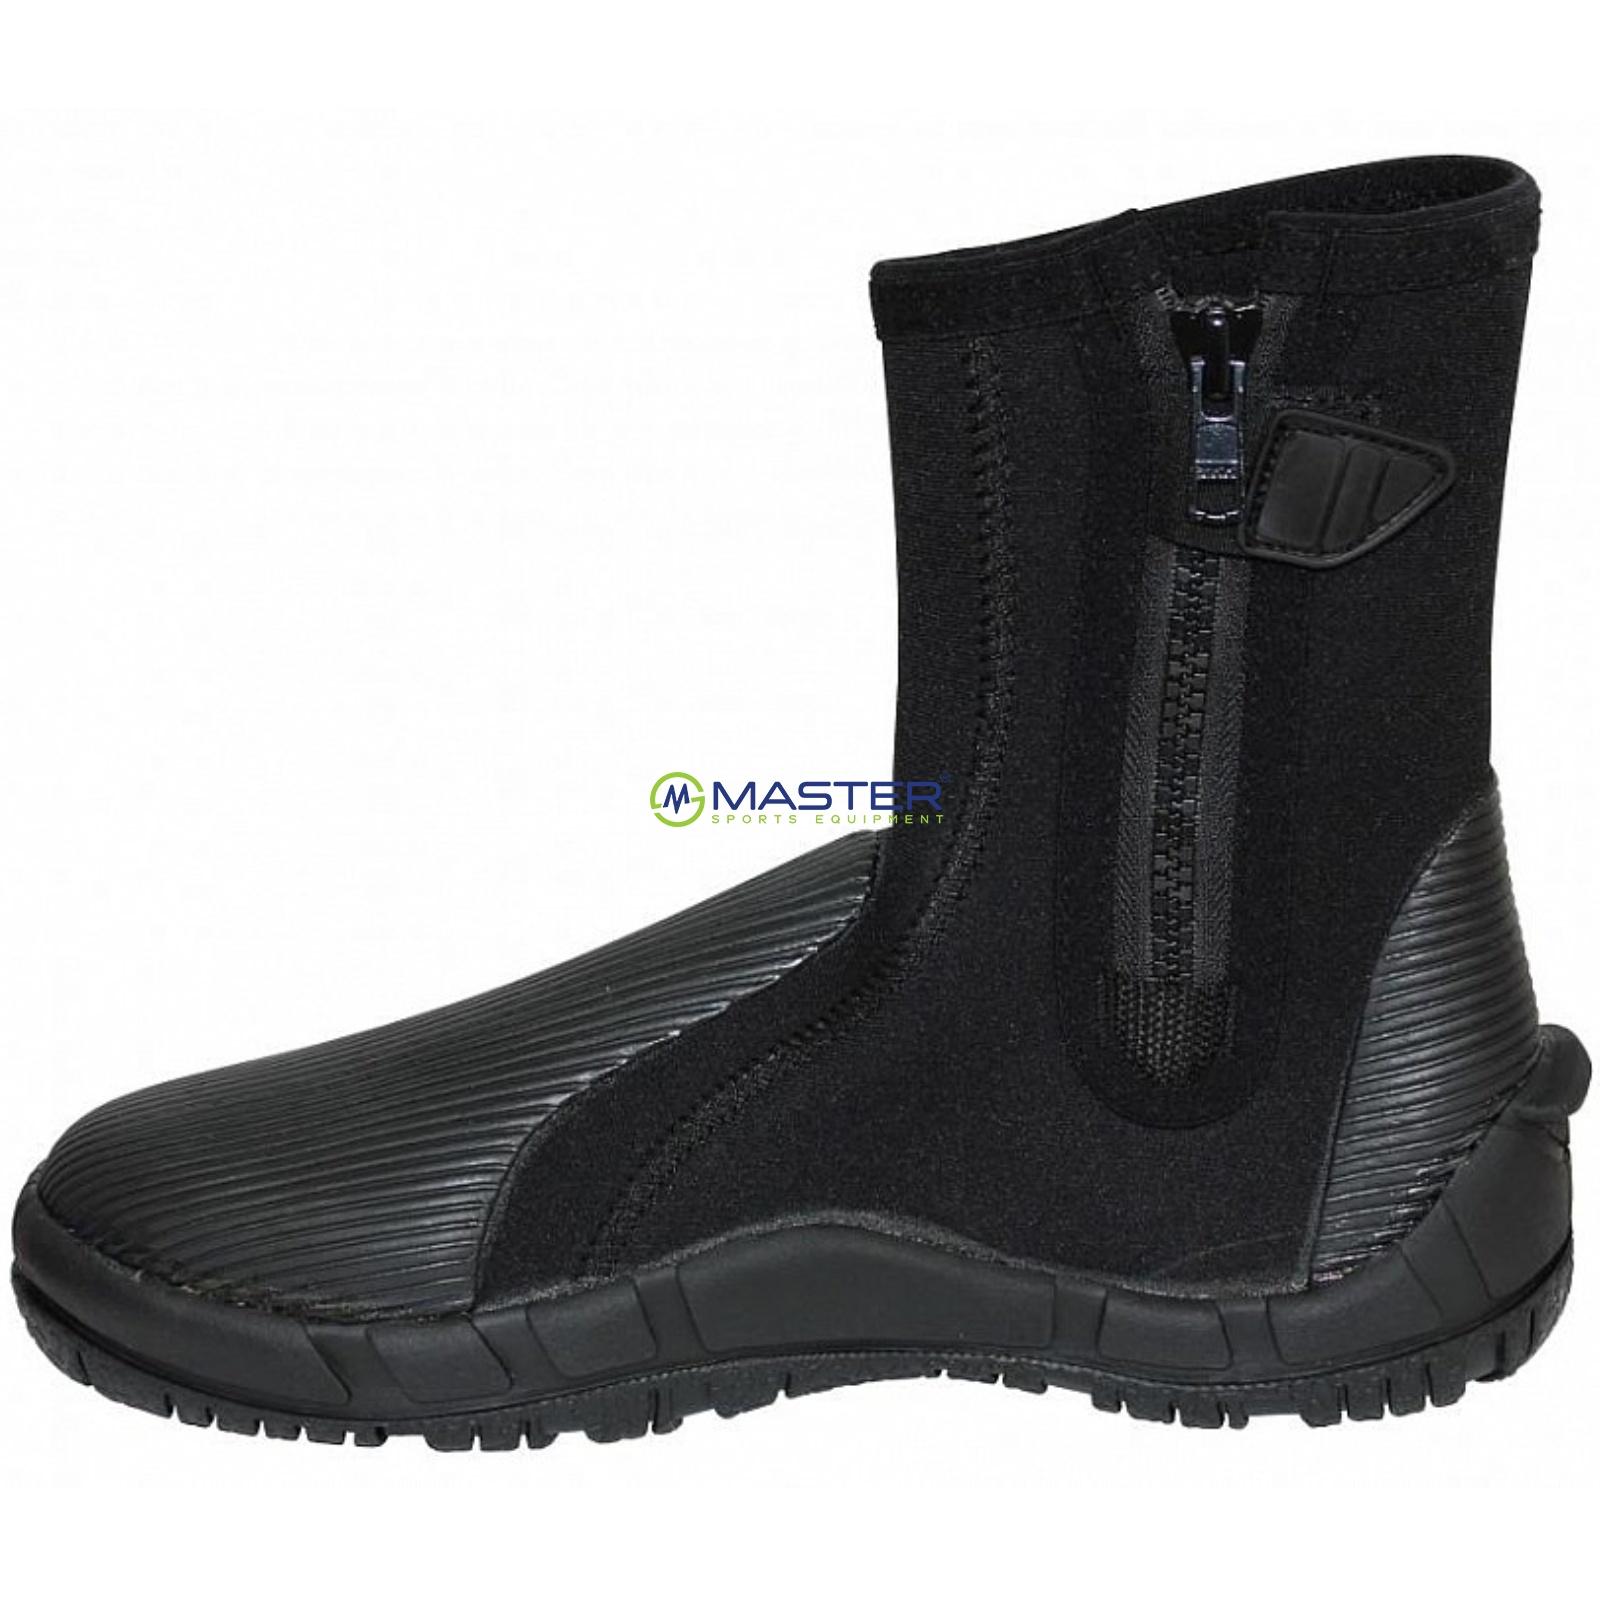 Neoprenové boty AGAMA Warcraft 5 mm  81be11c1f9